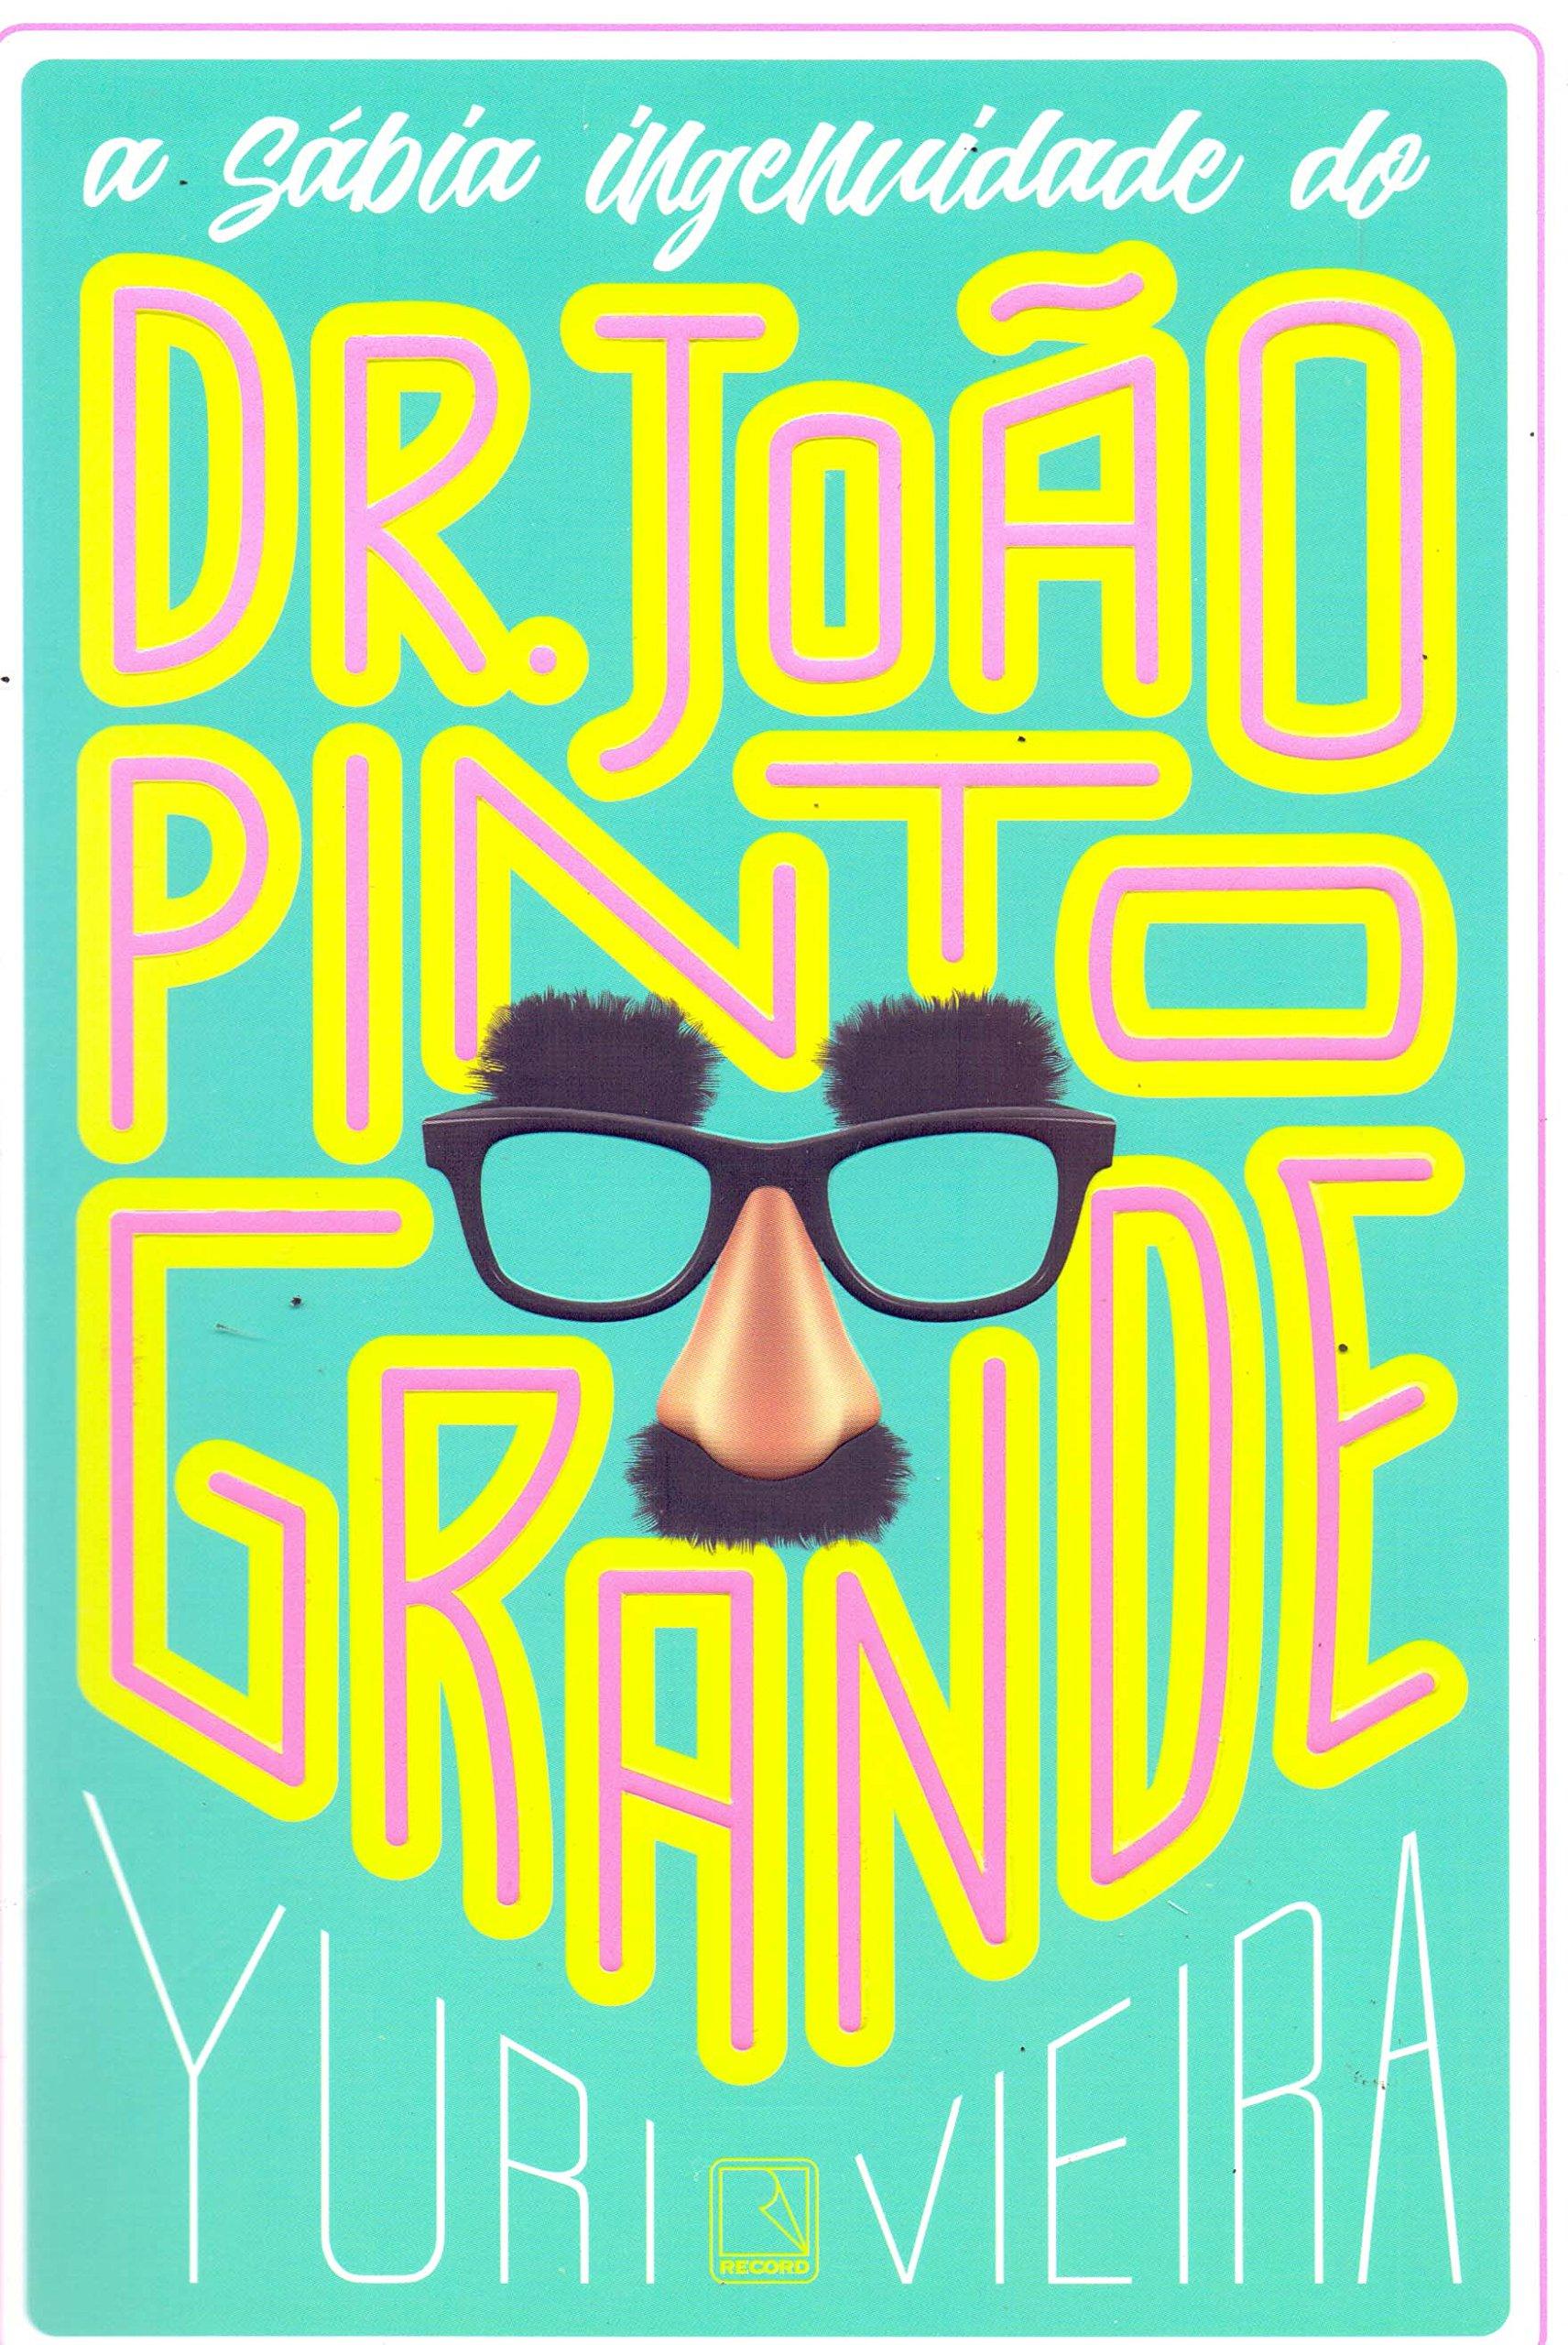 A sabia ingenuidade do Dr. Joao Pinto Grande